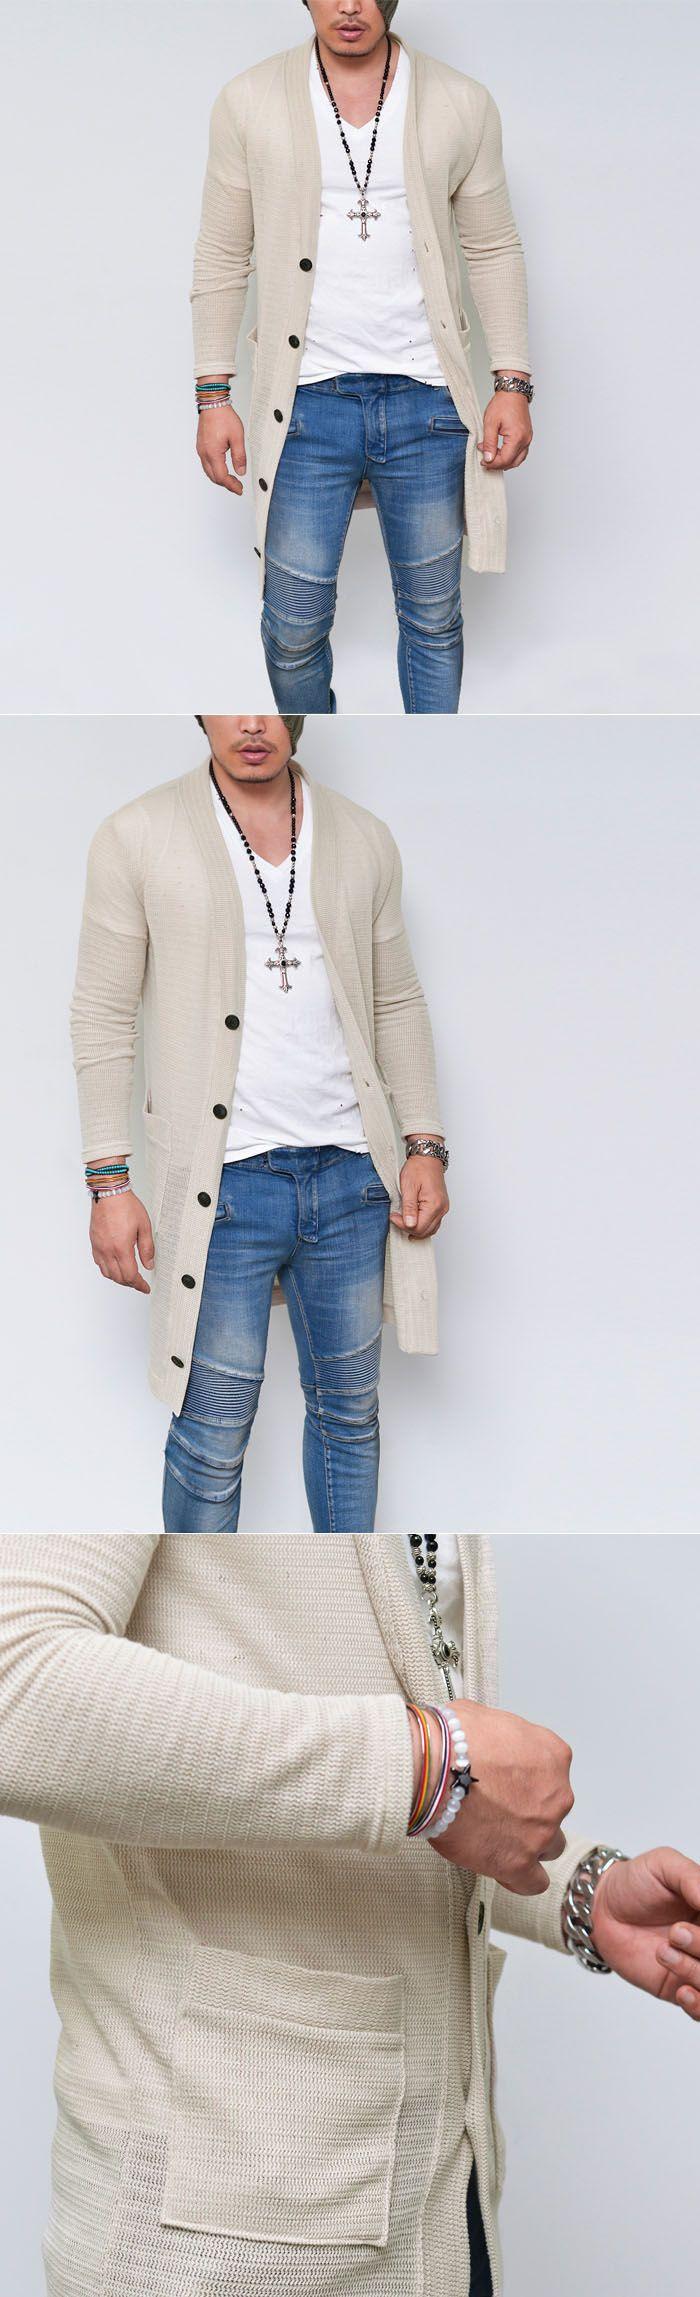 See-through Knit Long Button Jacket-Cardigan 115 - GUYLOOK